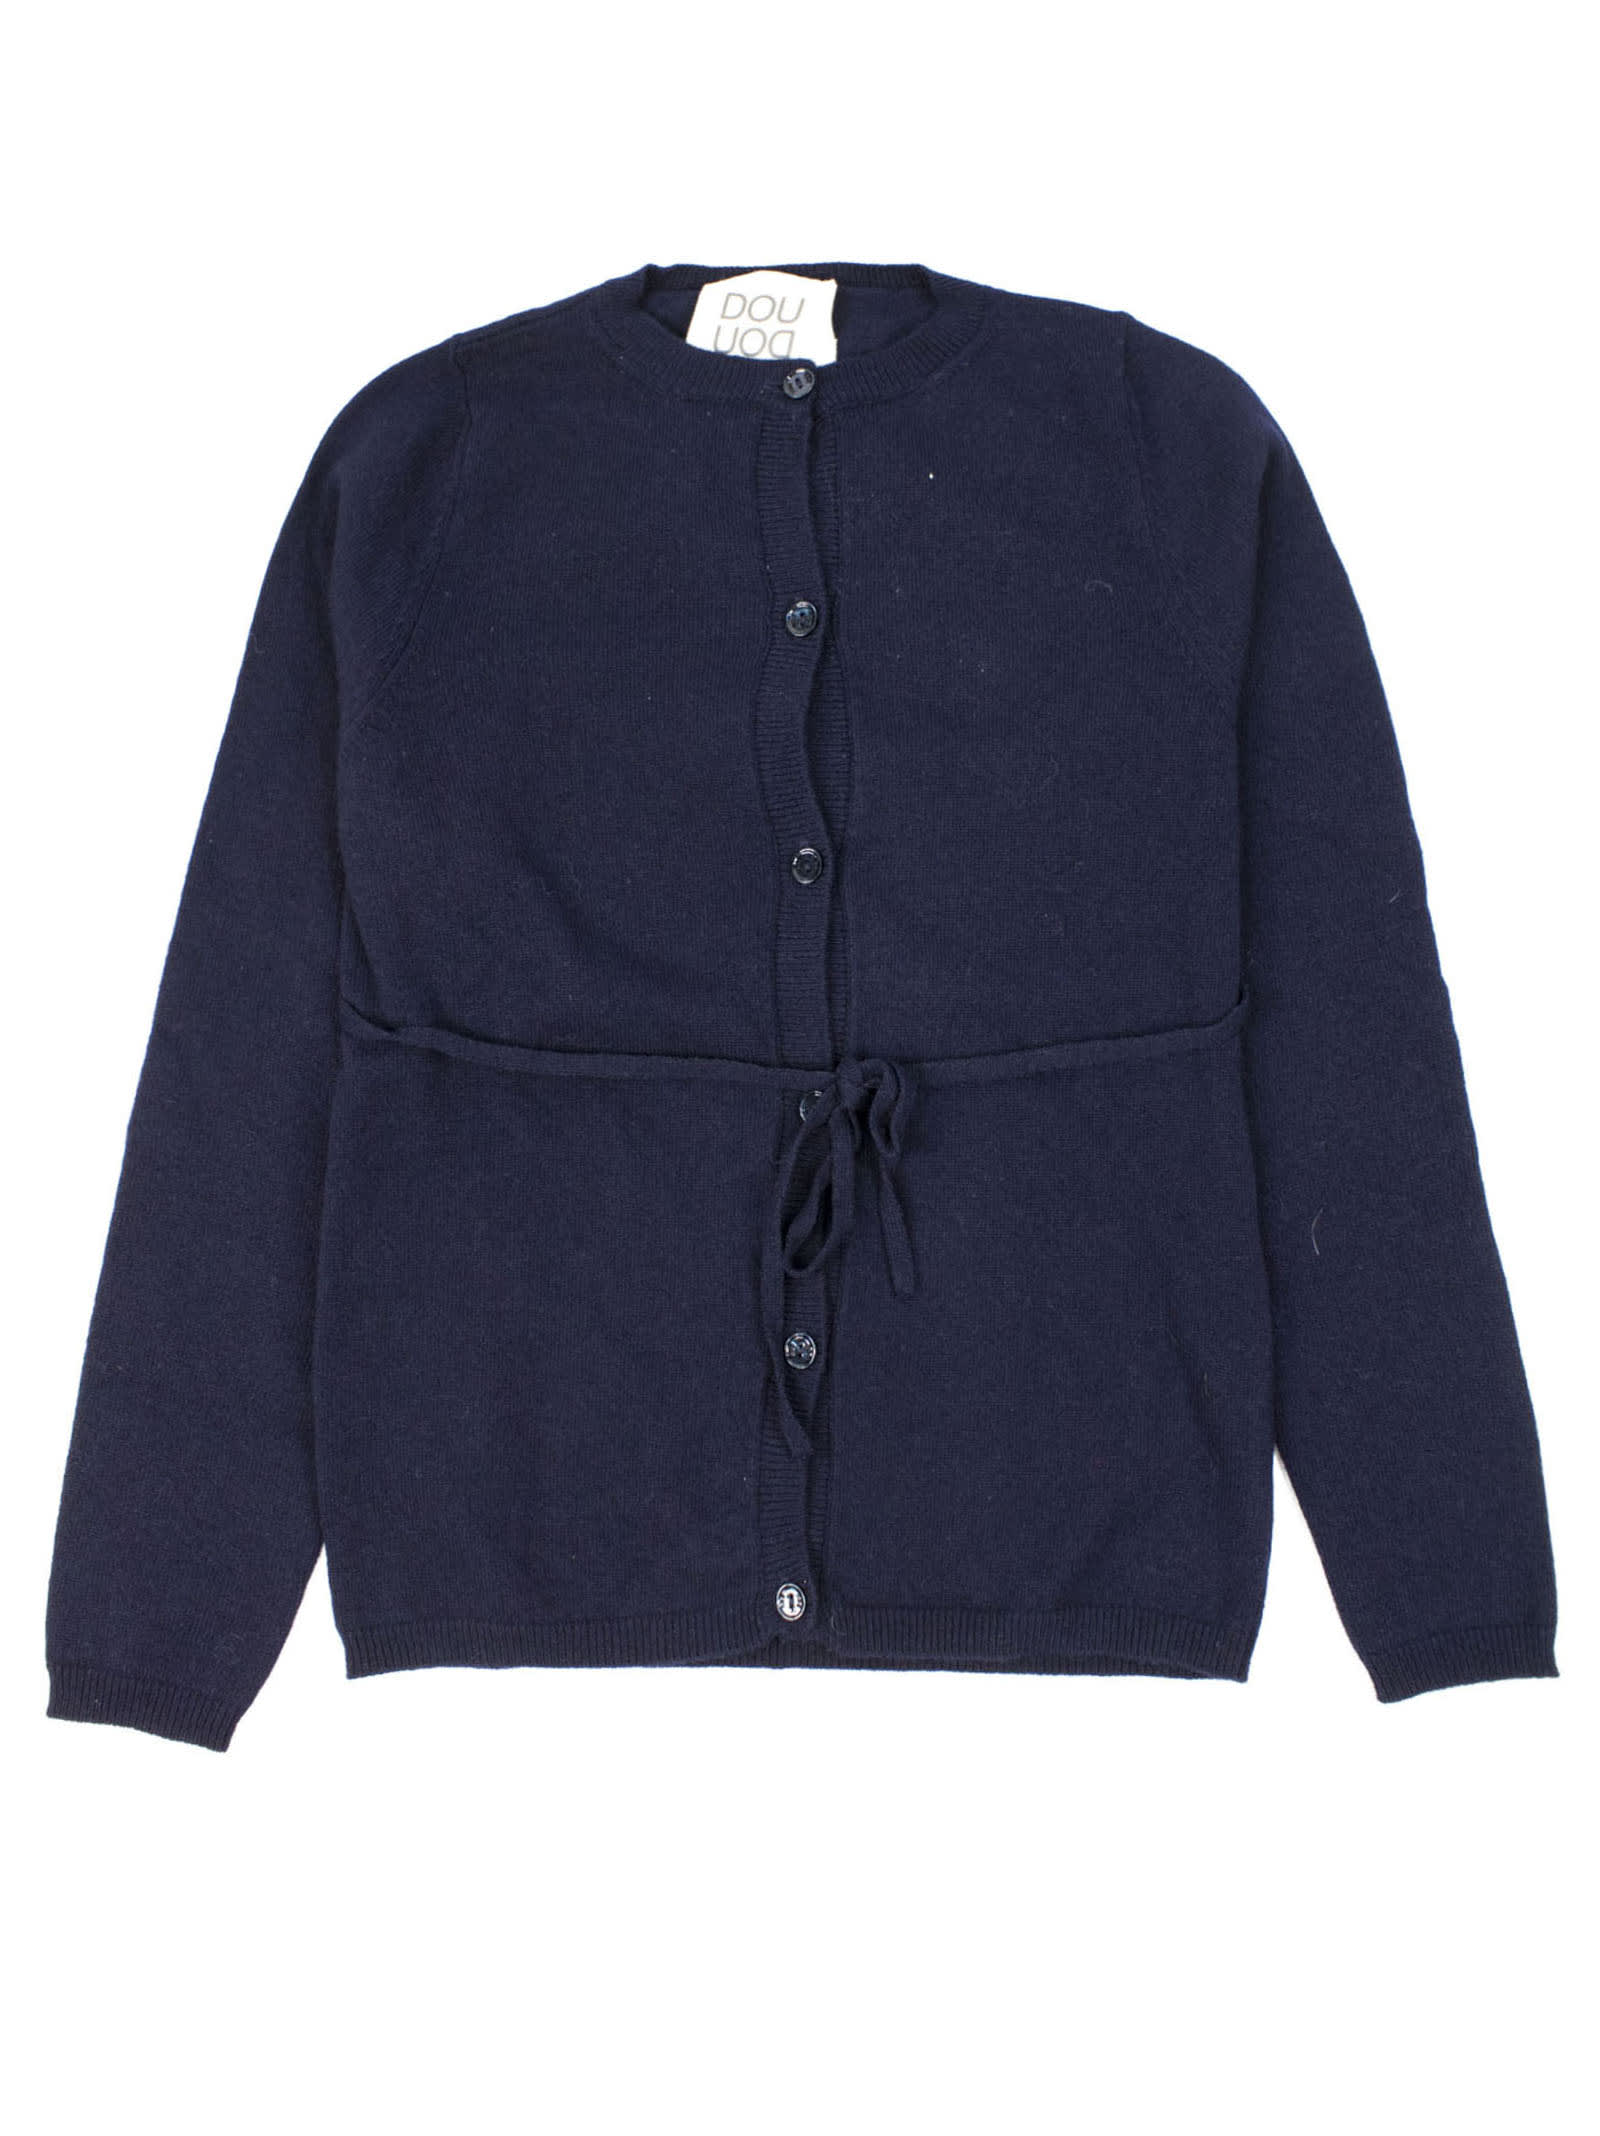 Blue Wool Blend Cardigan